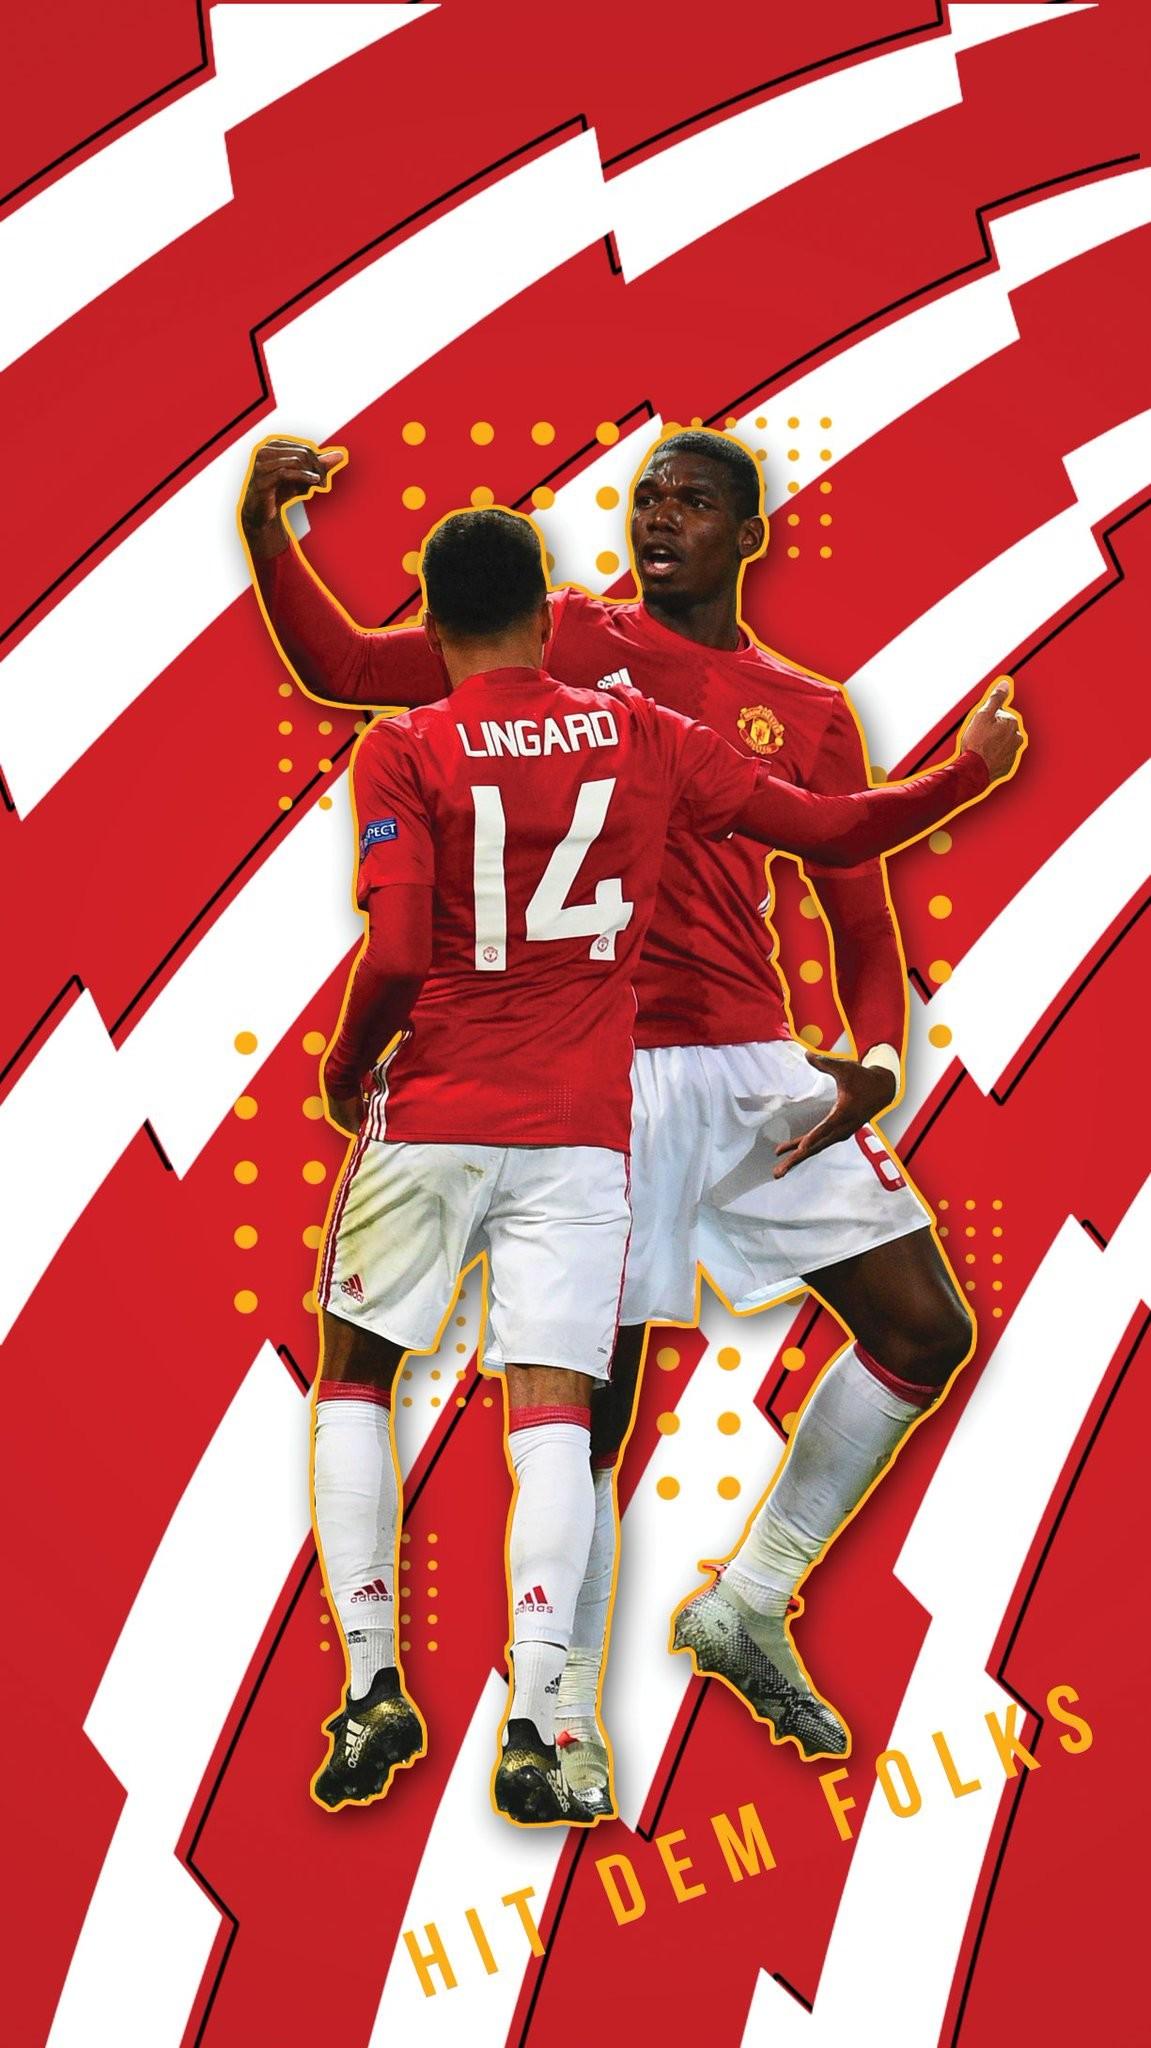 "Footy Wallpapers on Twitter: ""Jesse Lingard & Paul Pogba ""Hit Dem Folks""  iPhone wallpaper. RTs much appreciated #MUFC https://t.co/XLDry5EBaY"""